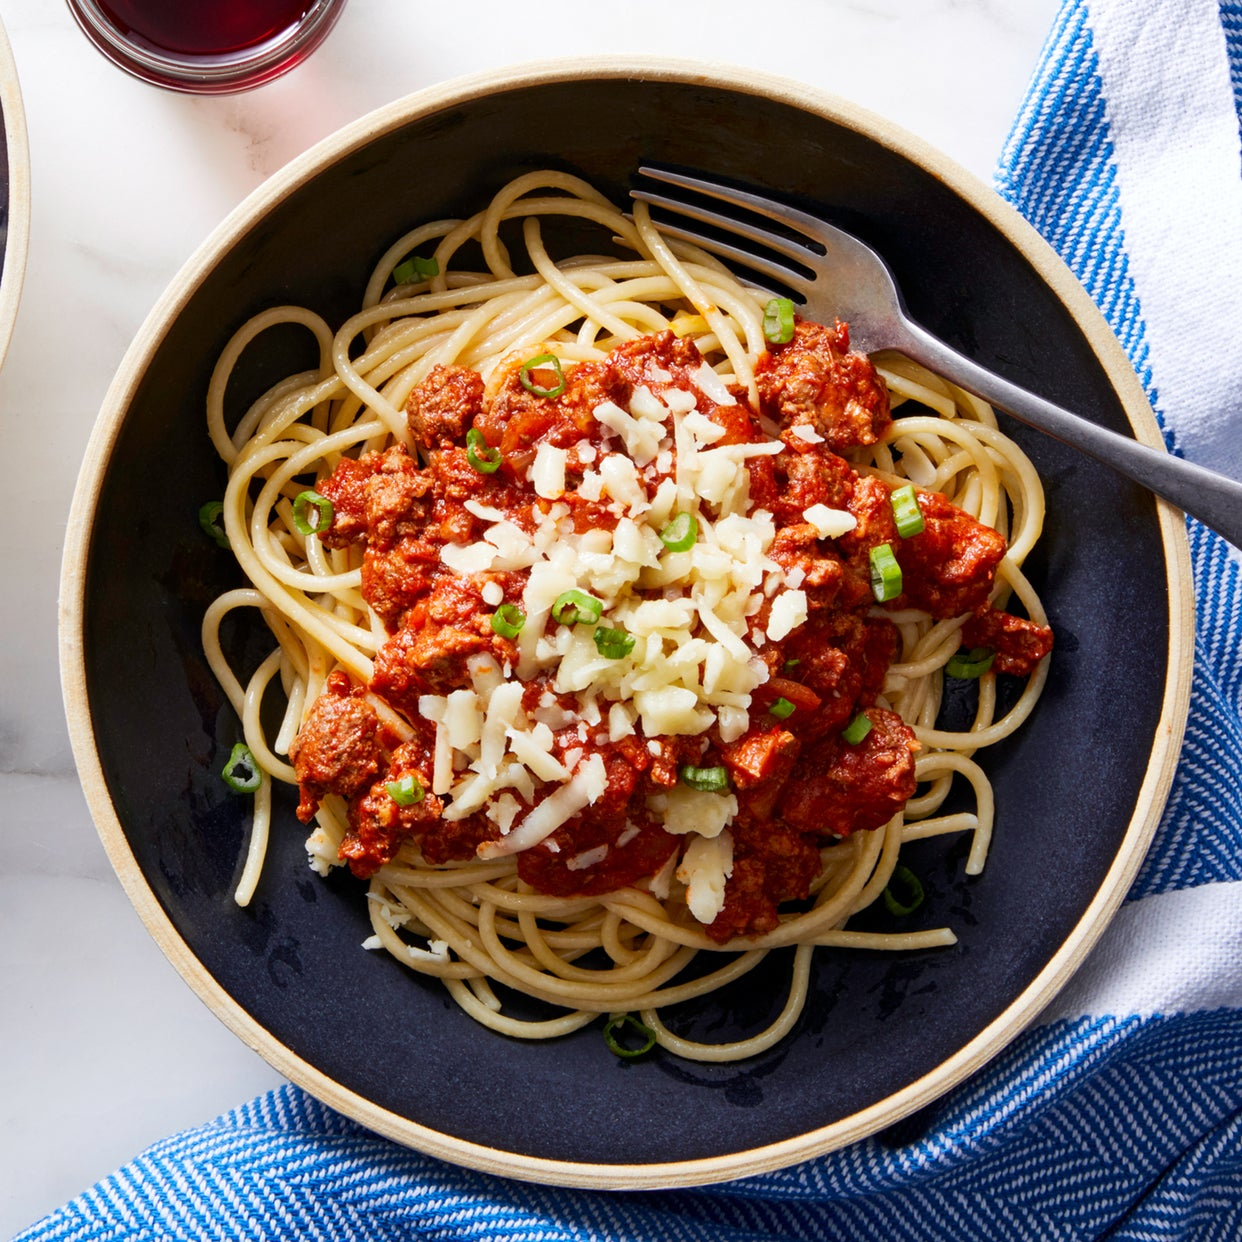 Cincinnati-Style Beef Chili with Spaghetti & White Cheddar Cheese